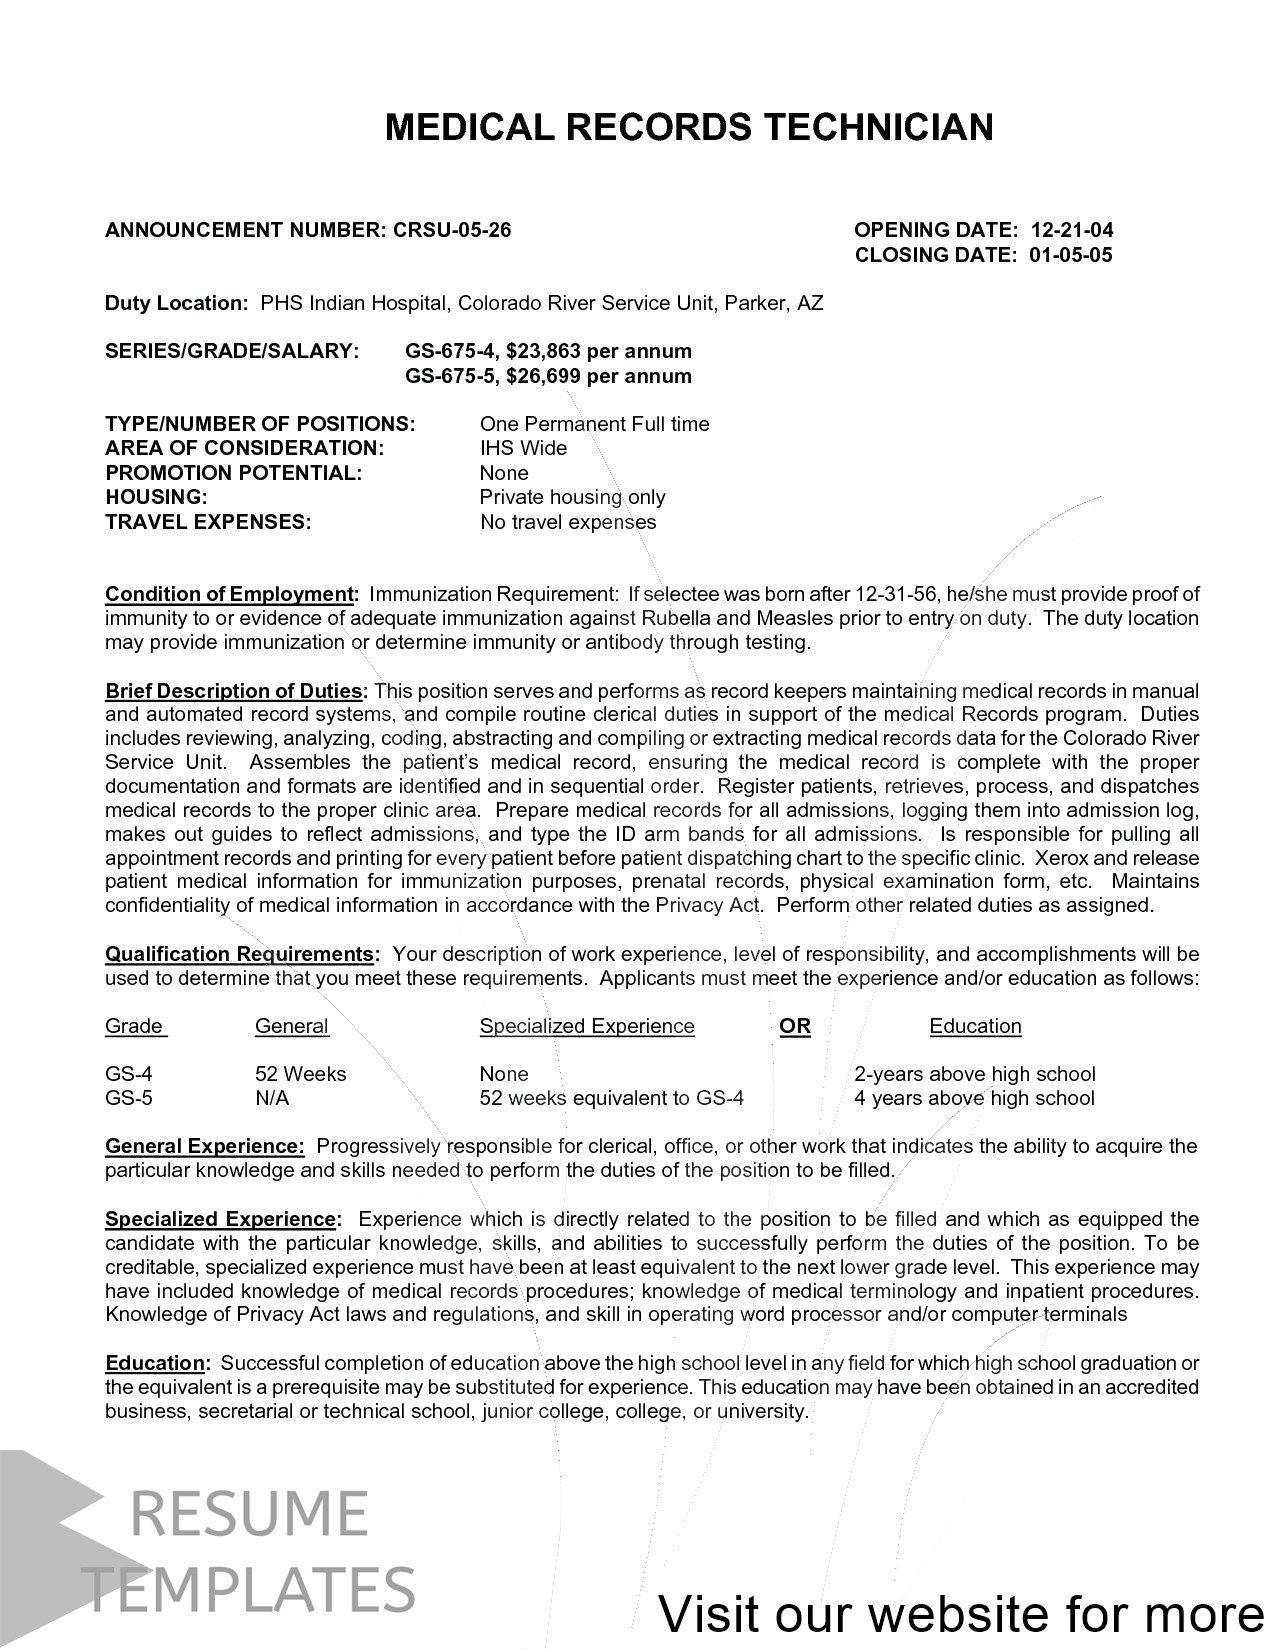 resume examples career change in 2020 Receptionist jobs